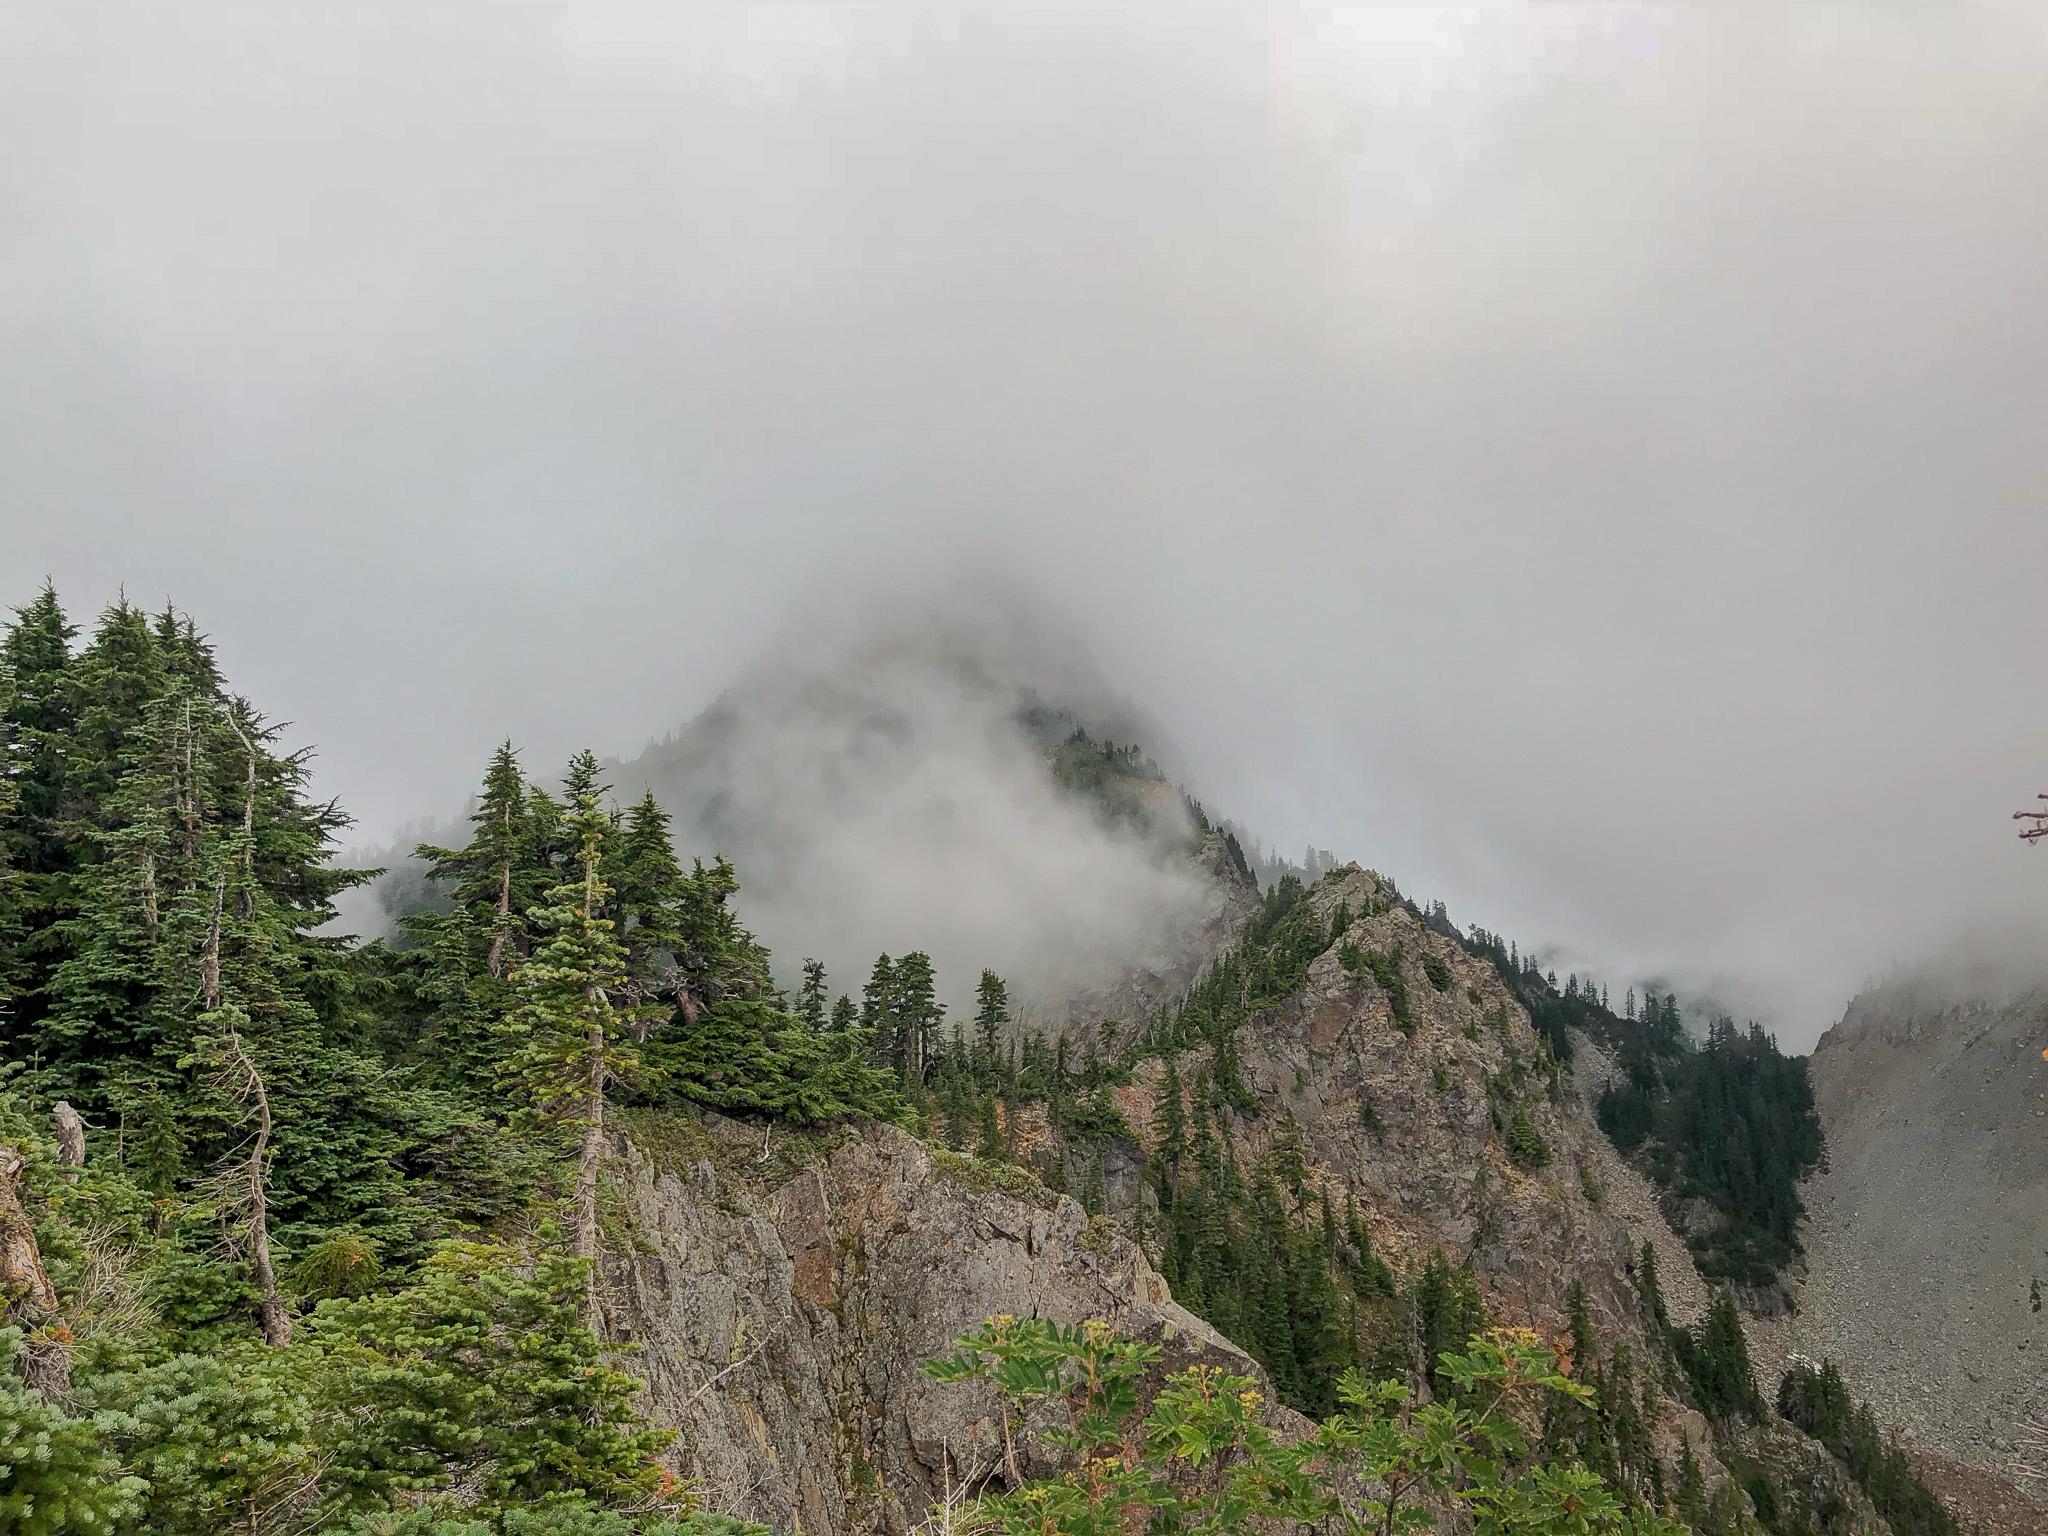 Kaleetan, obscured by clouds.